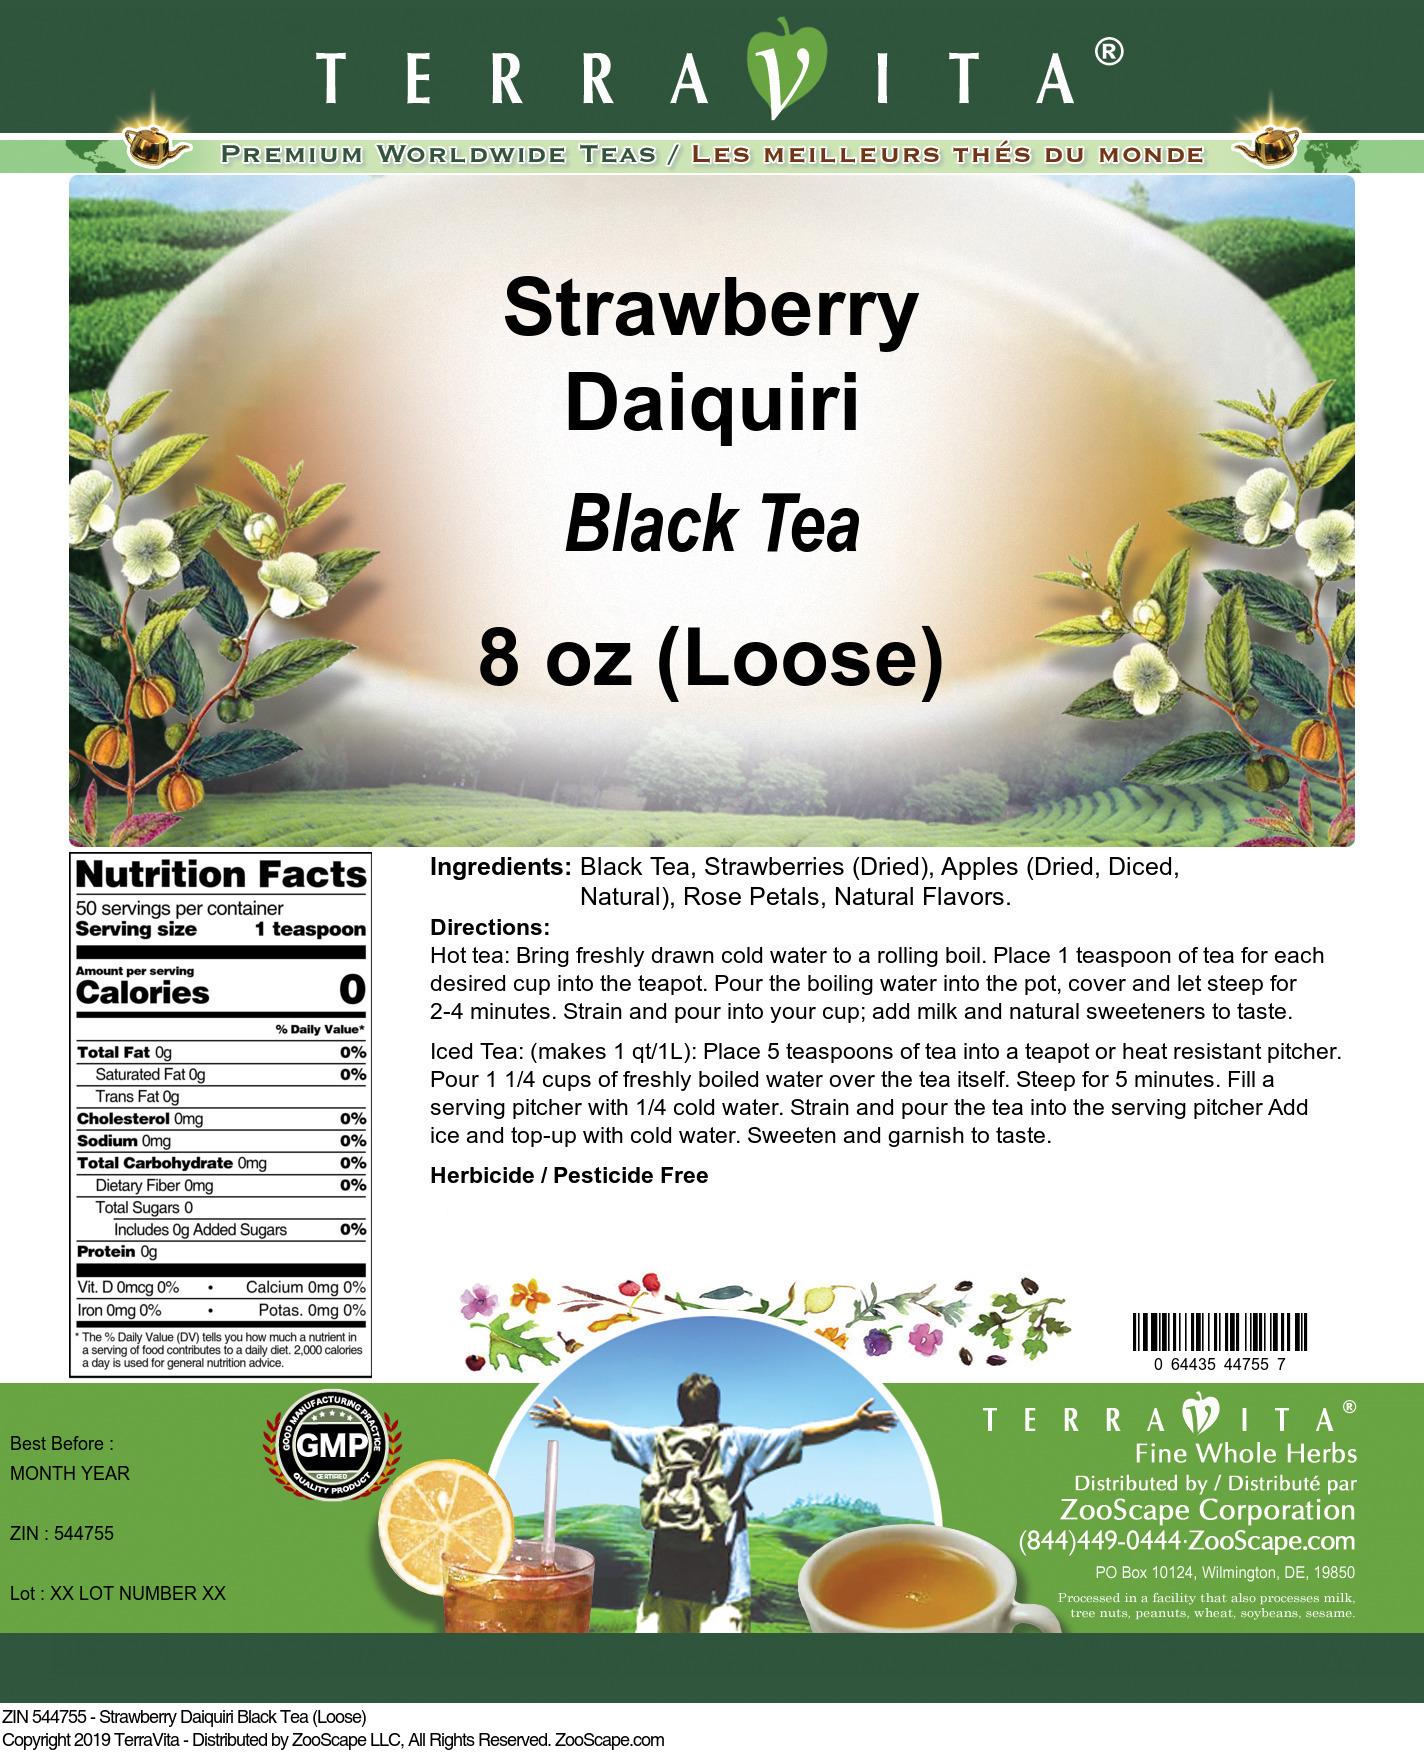 Strawberry Daiquiri Black Tea (Loose)